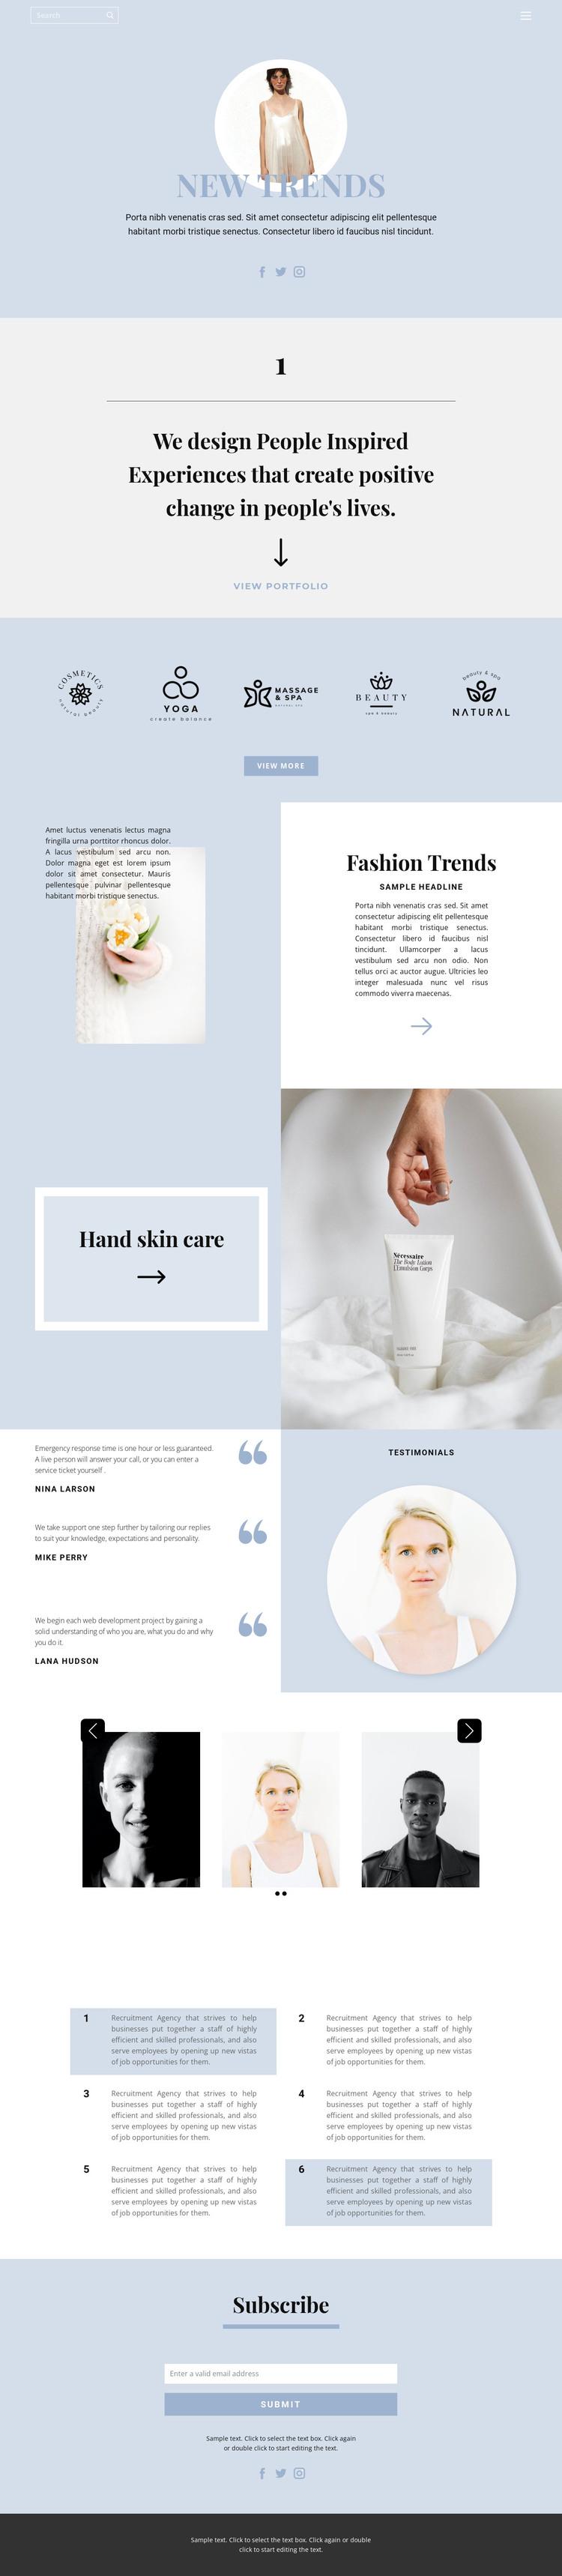 Setting trends Web Design